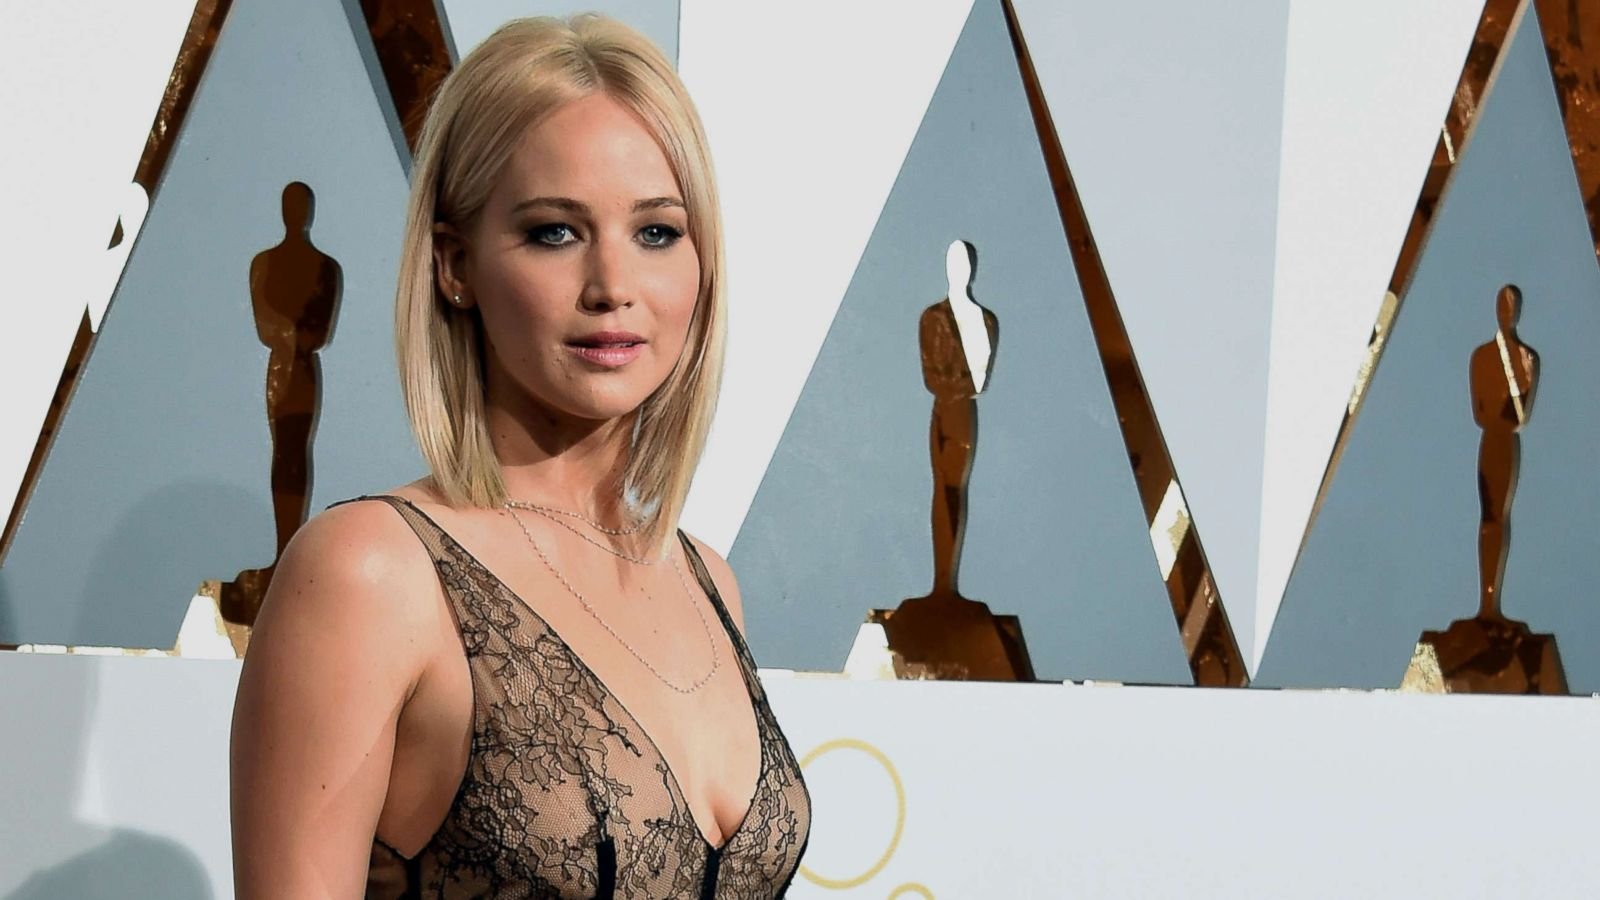 20af5082ac5 Jennifer Lawrence and Dior face backlash, claims of cultural ...